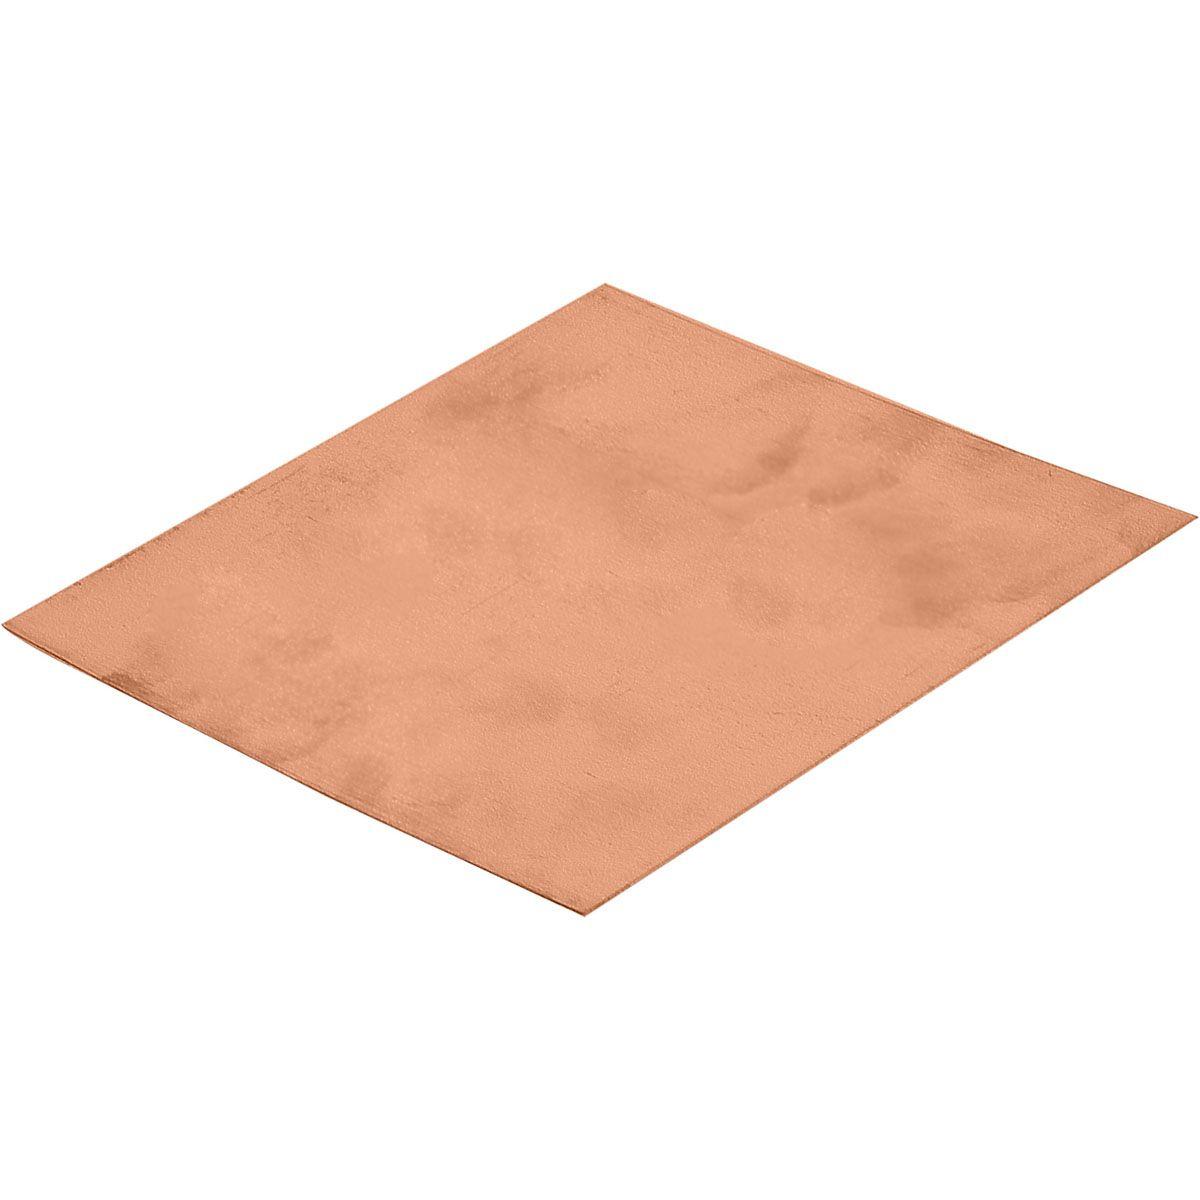 Copper Sheet 24 Gauge 6x6 Copper Sheets Sheet Metal Copper